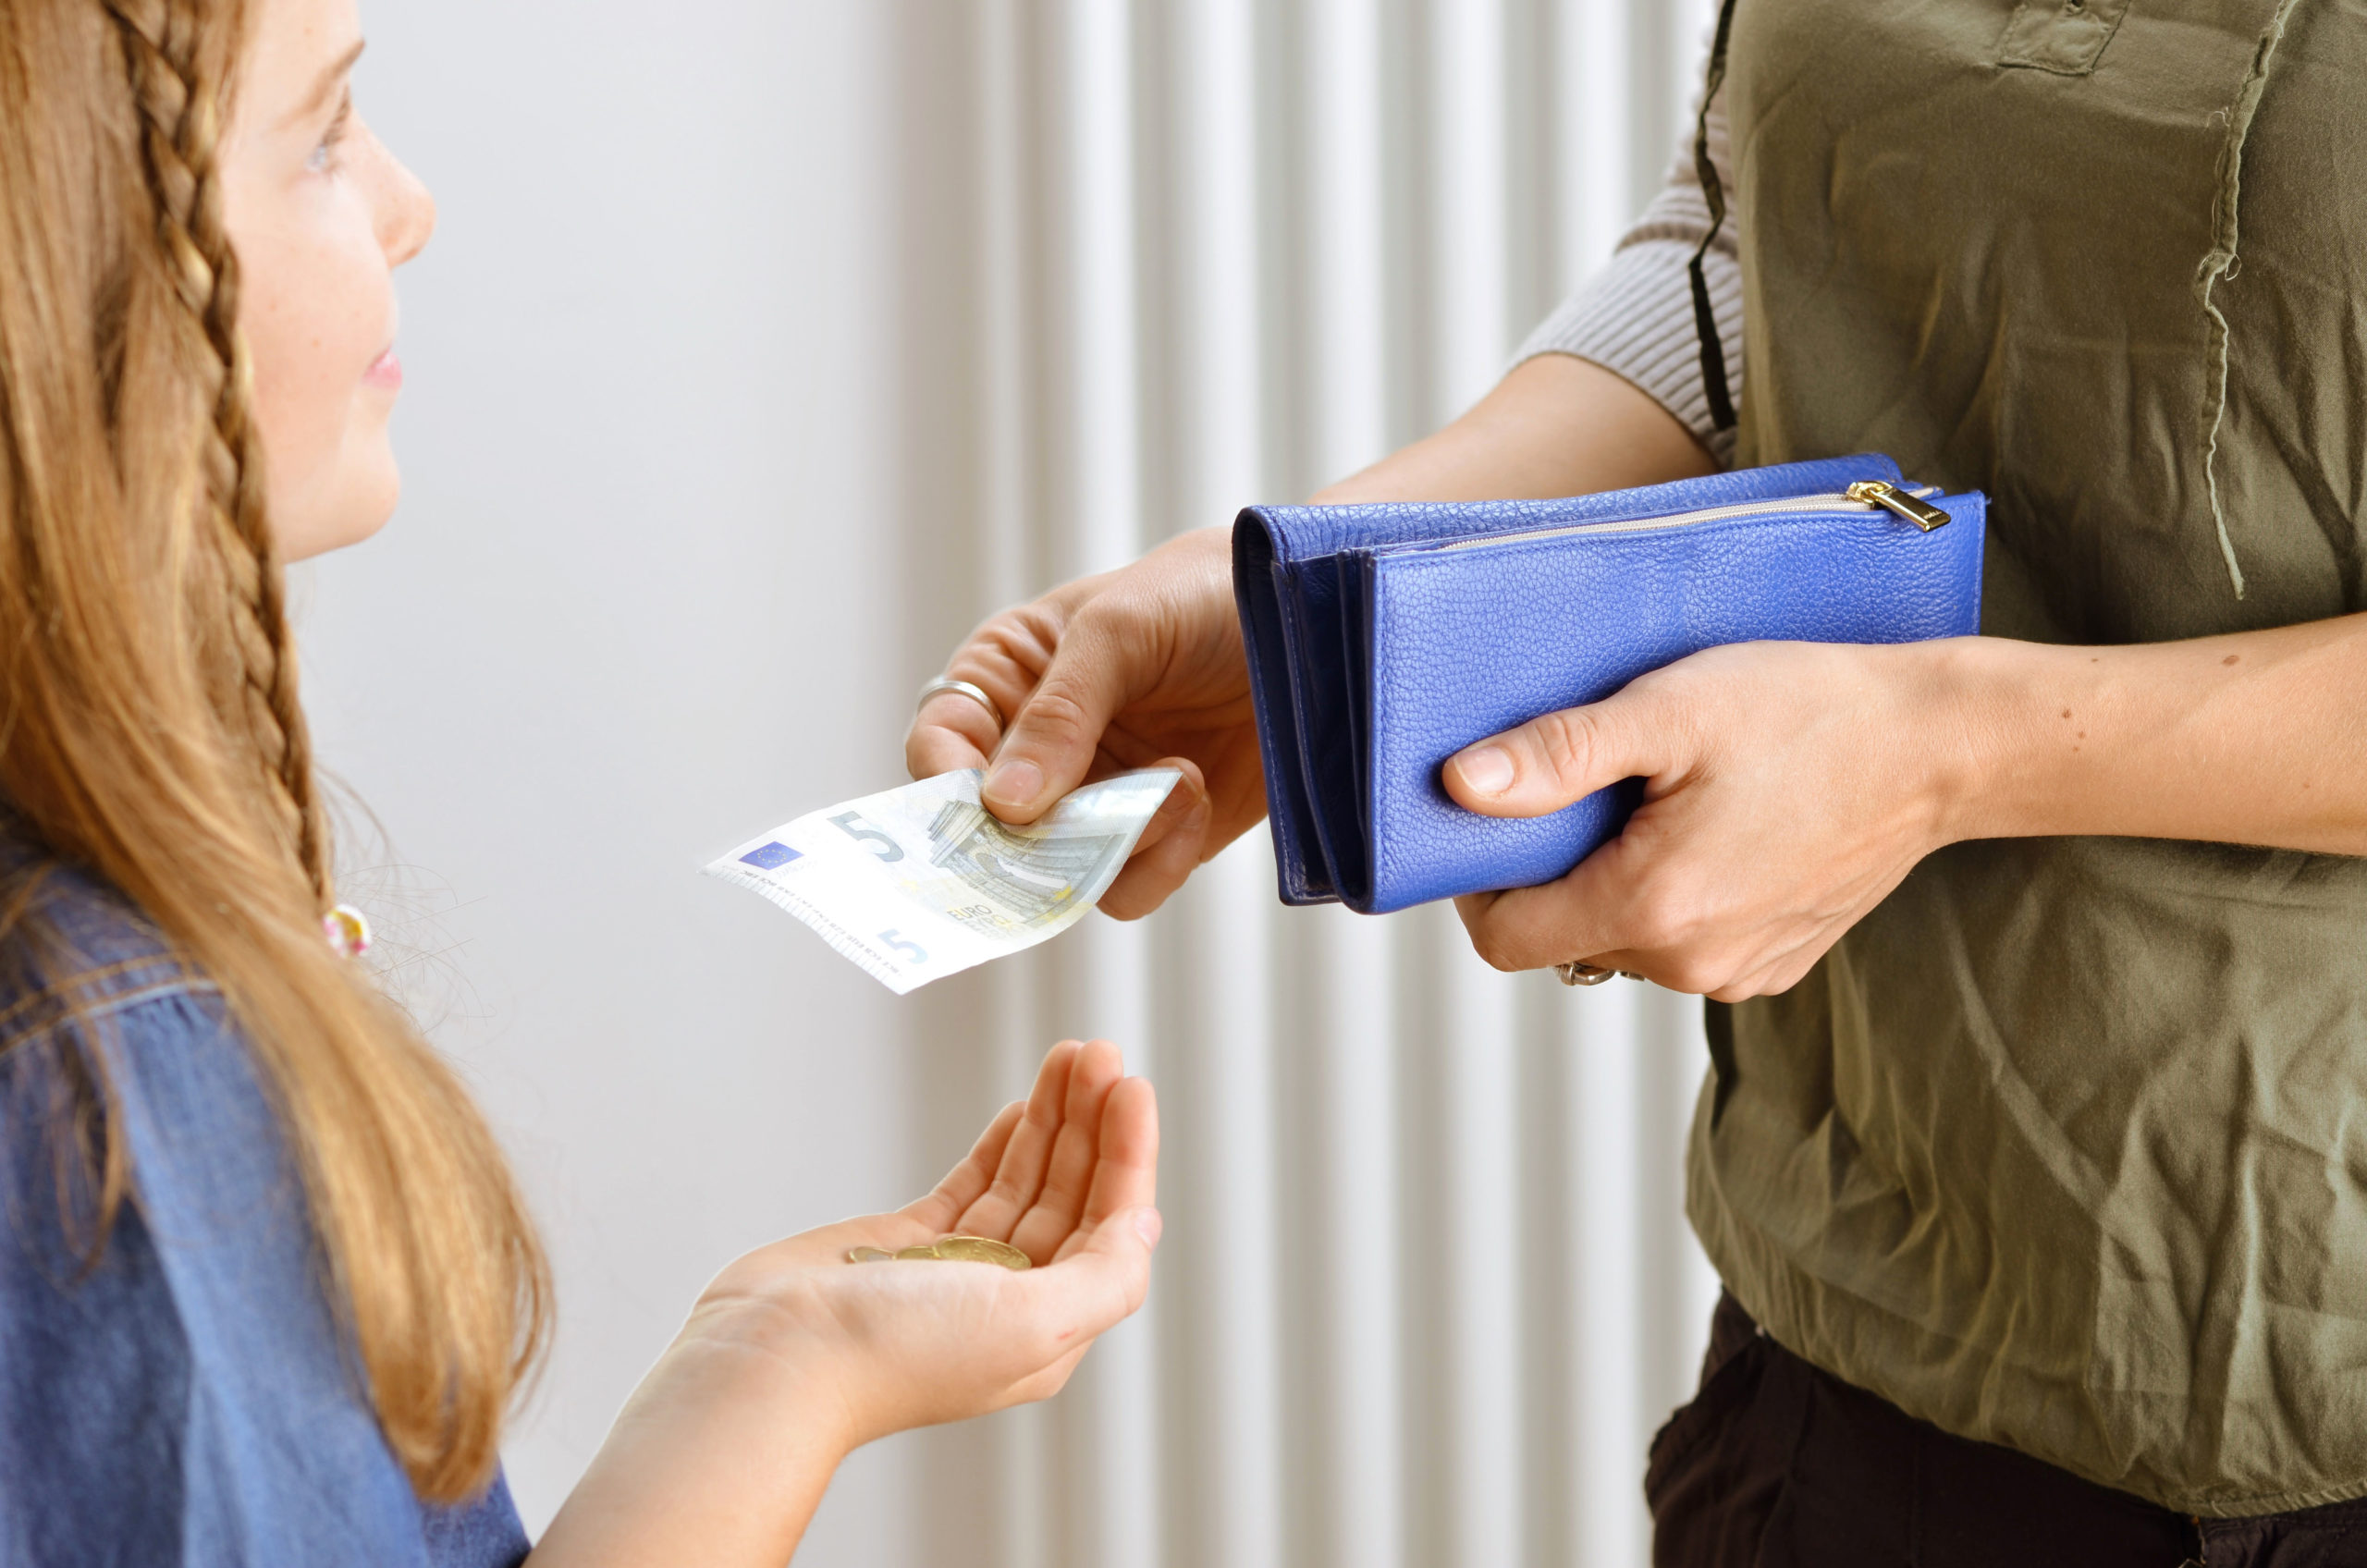 Tochter bekommt Taschengeld - Als Familie sparen